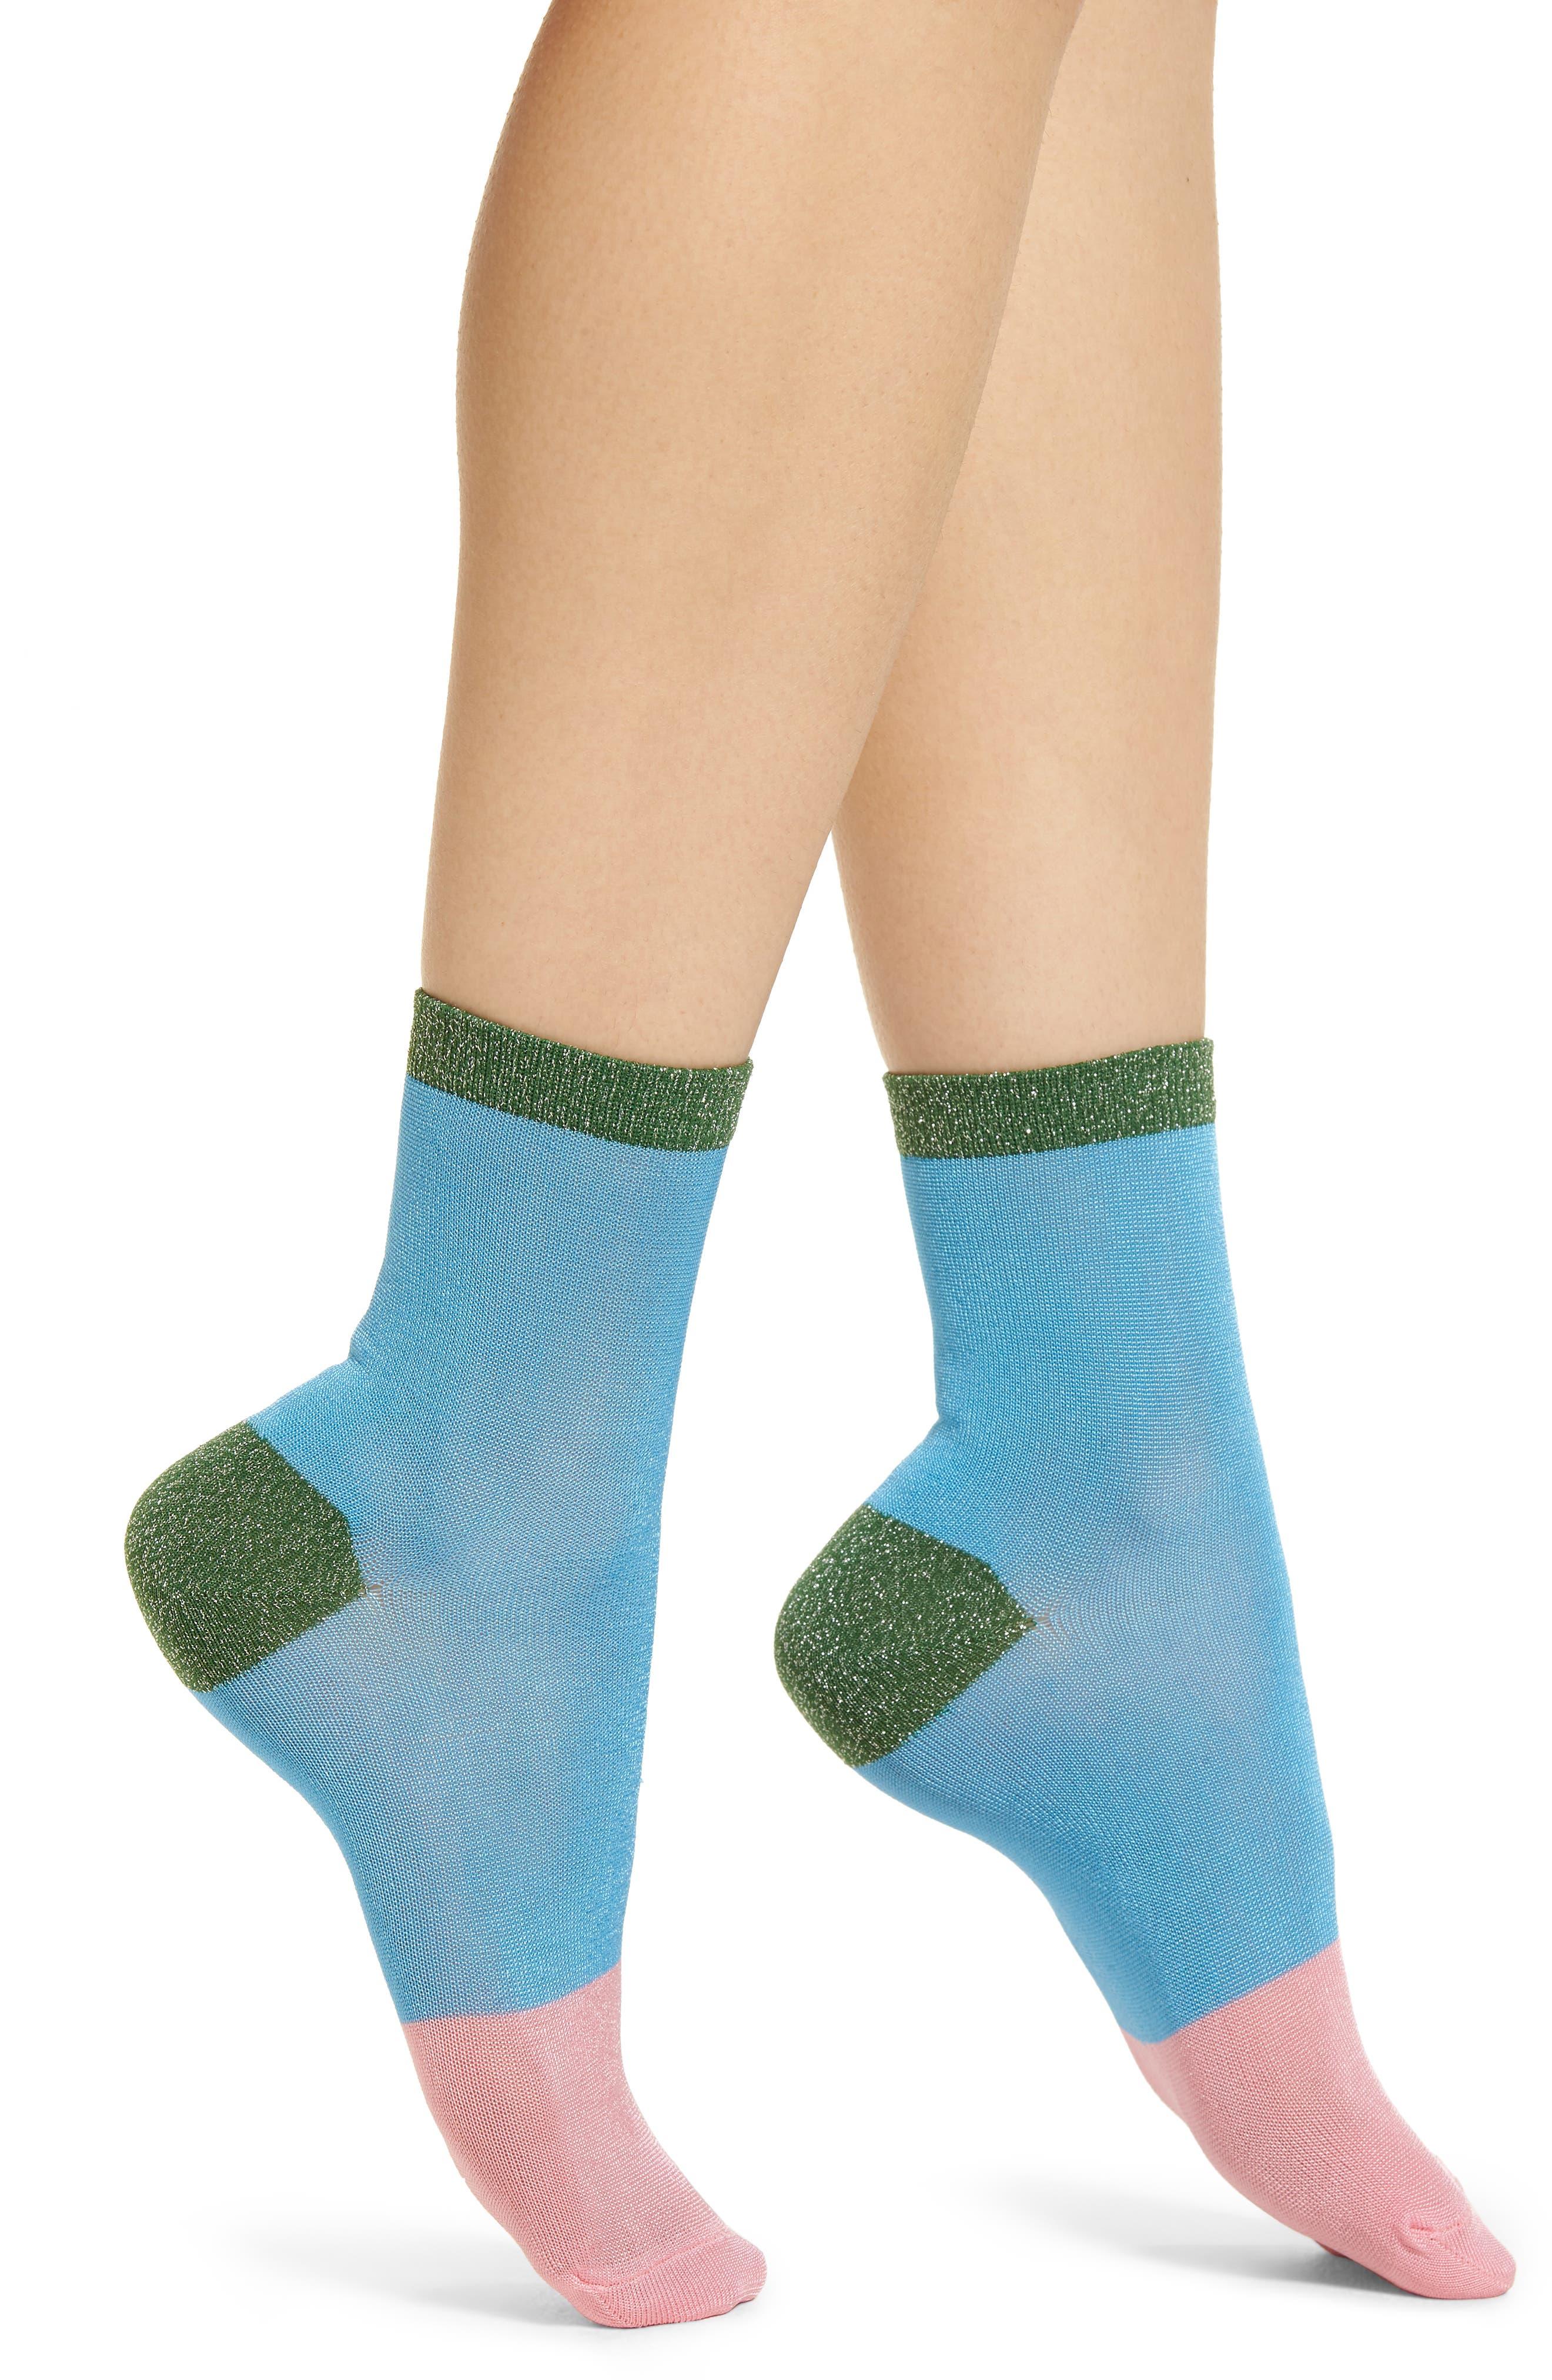 Alternate Image 1 Selected - Hysteria by Happy Socks Liza Sparkle Ankle Socks